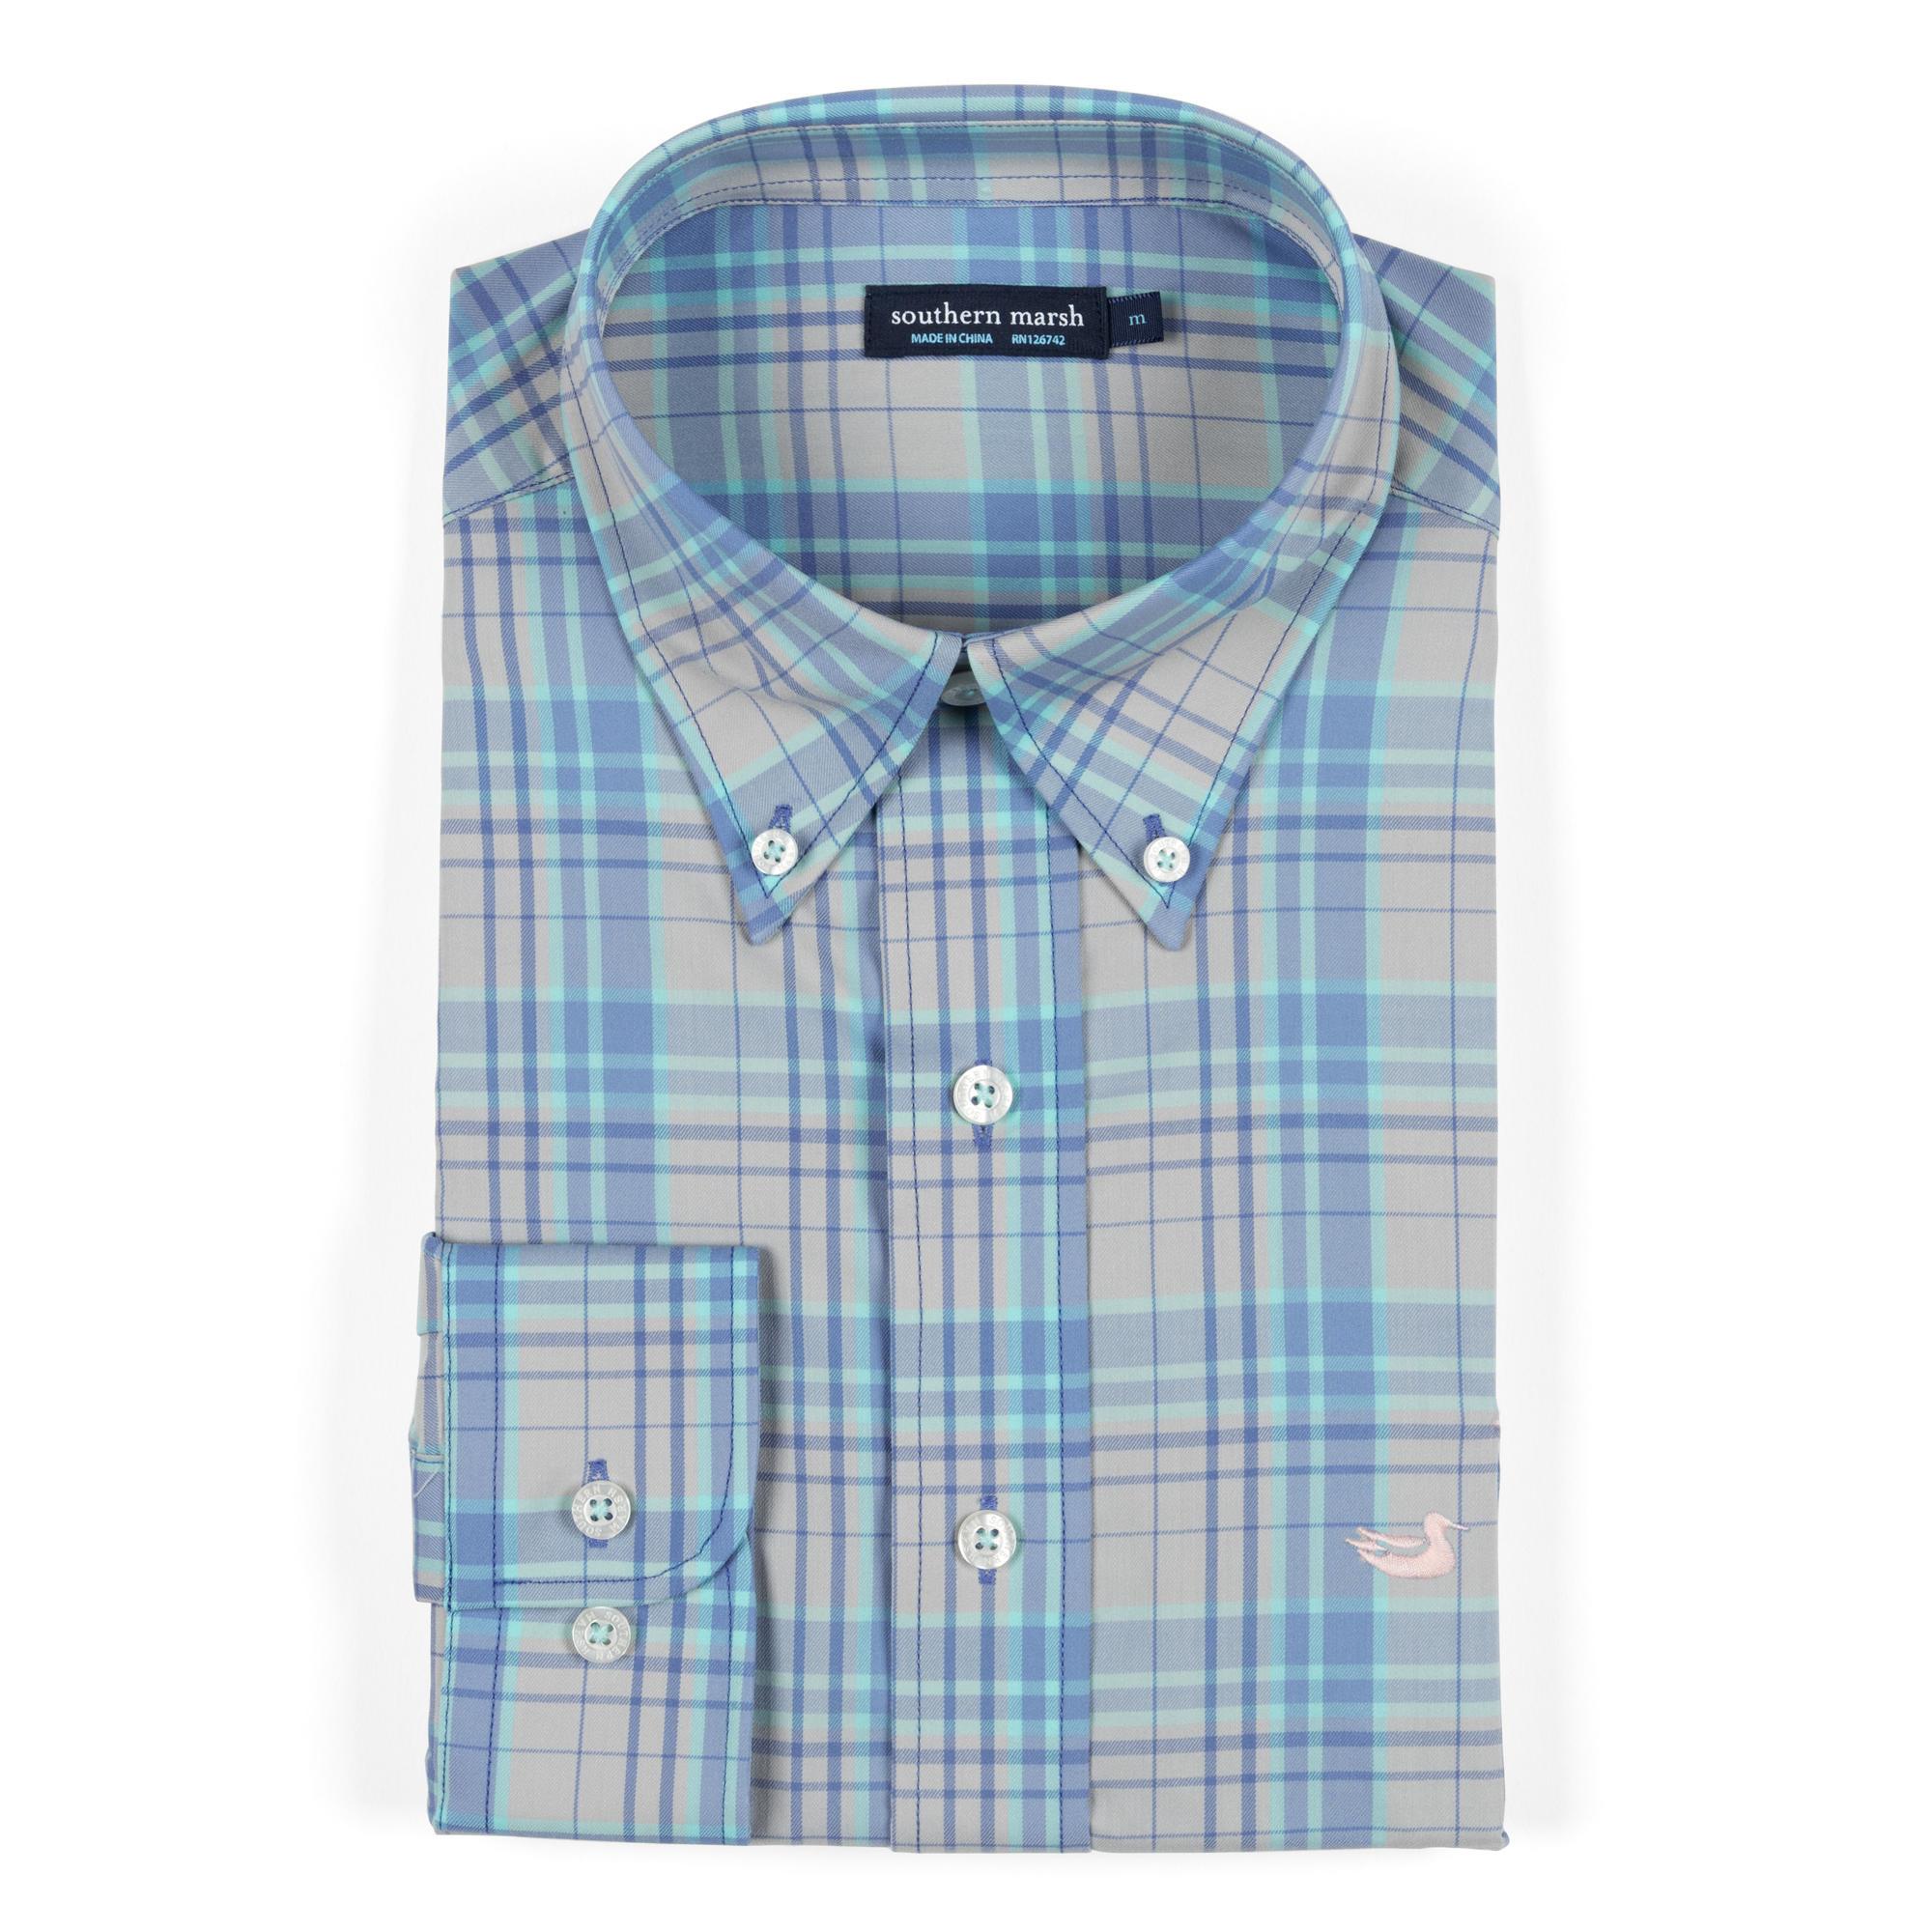 Southern Marsh Louisville Performance Dress Shirt